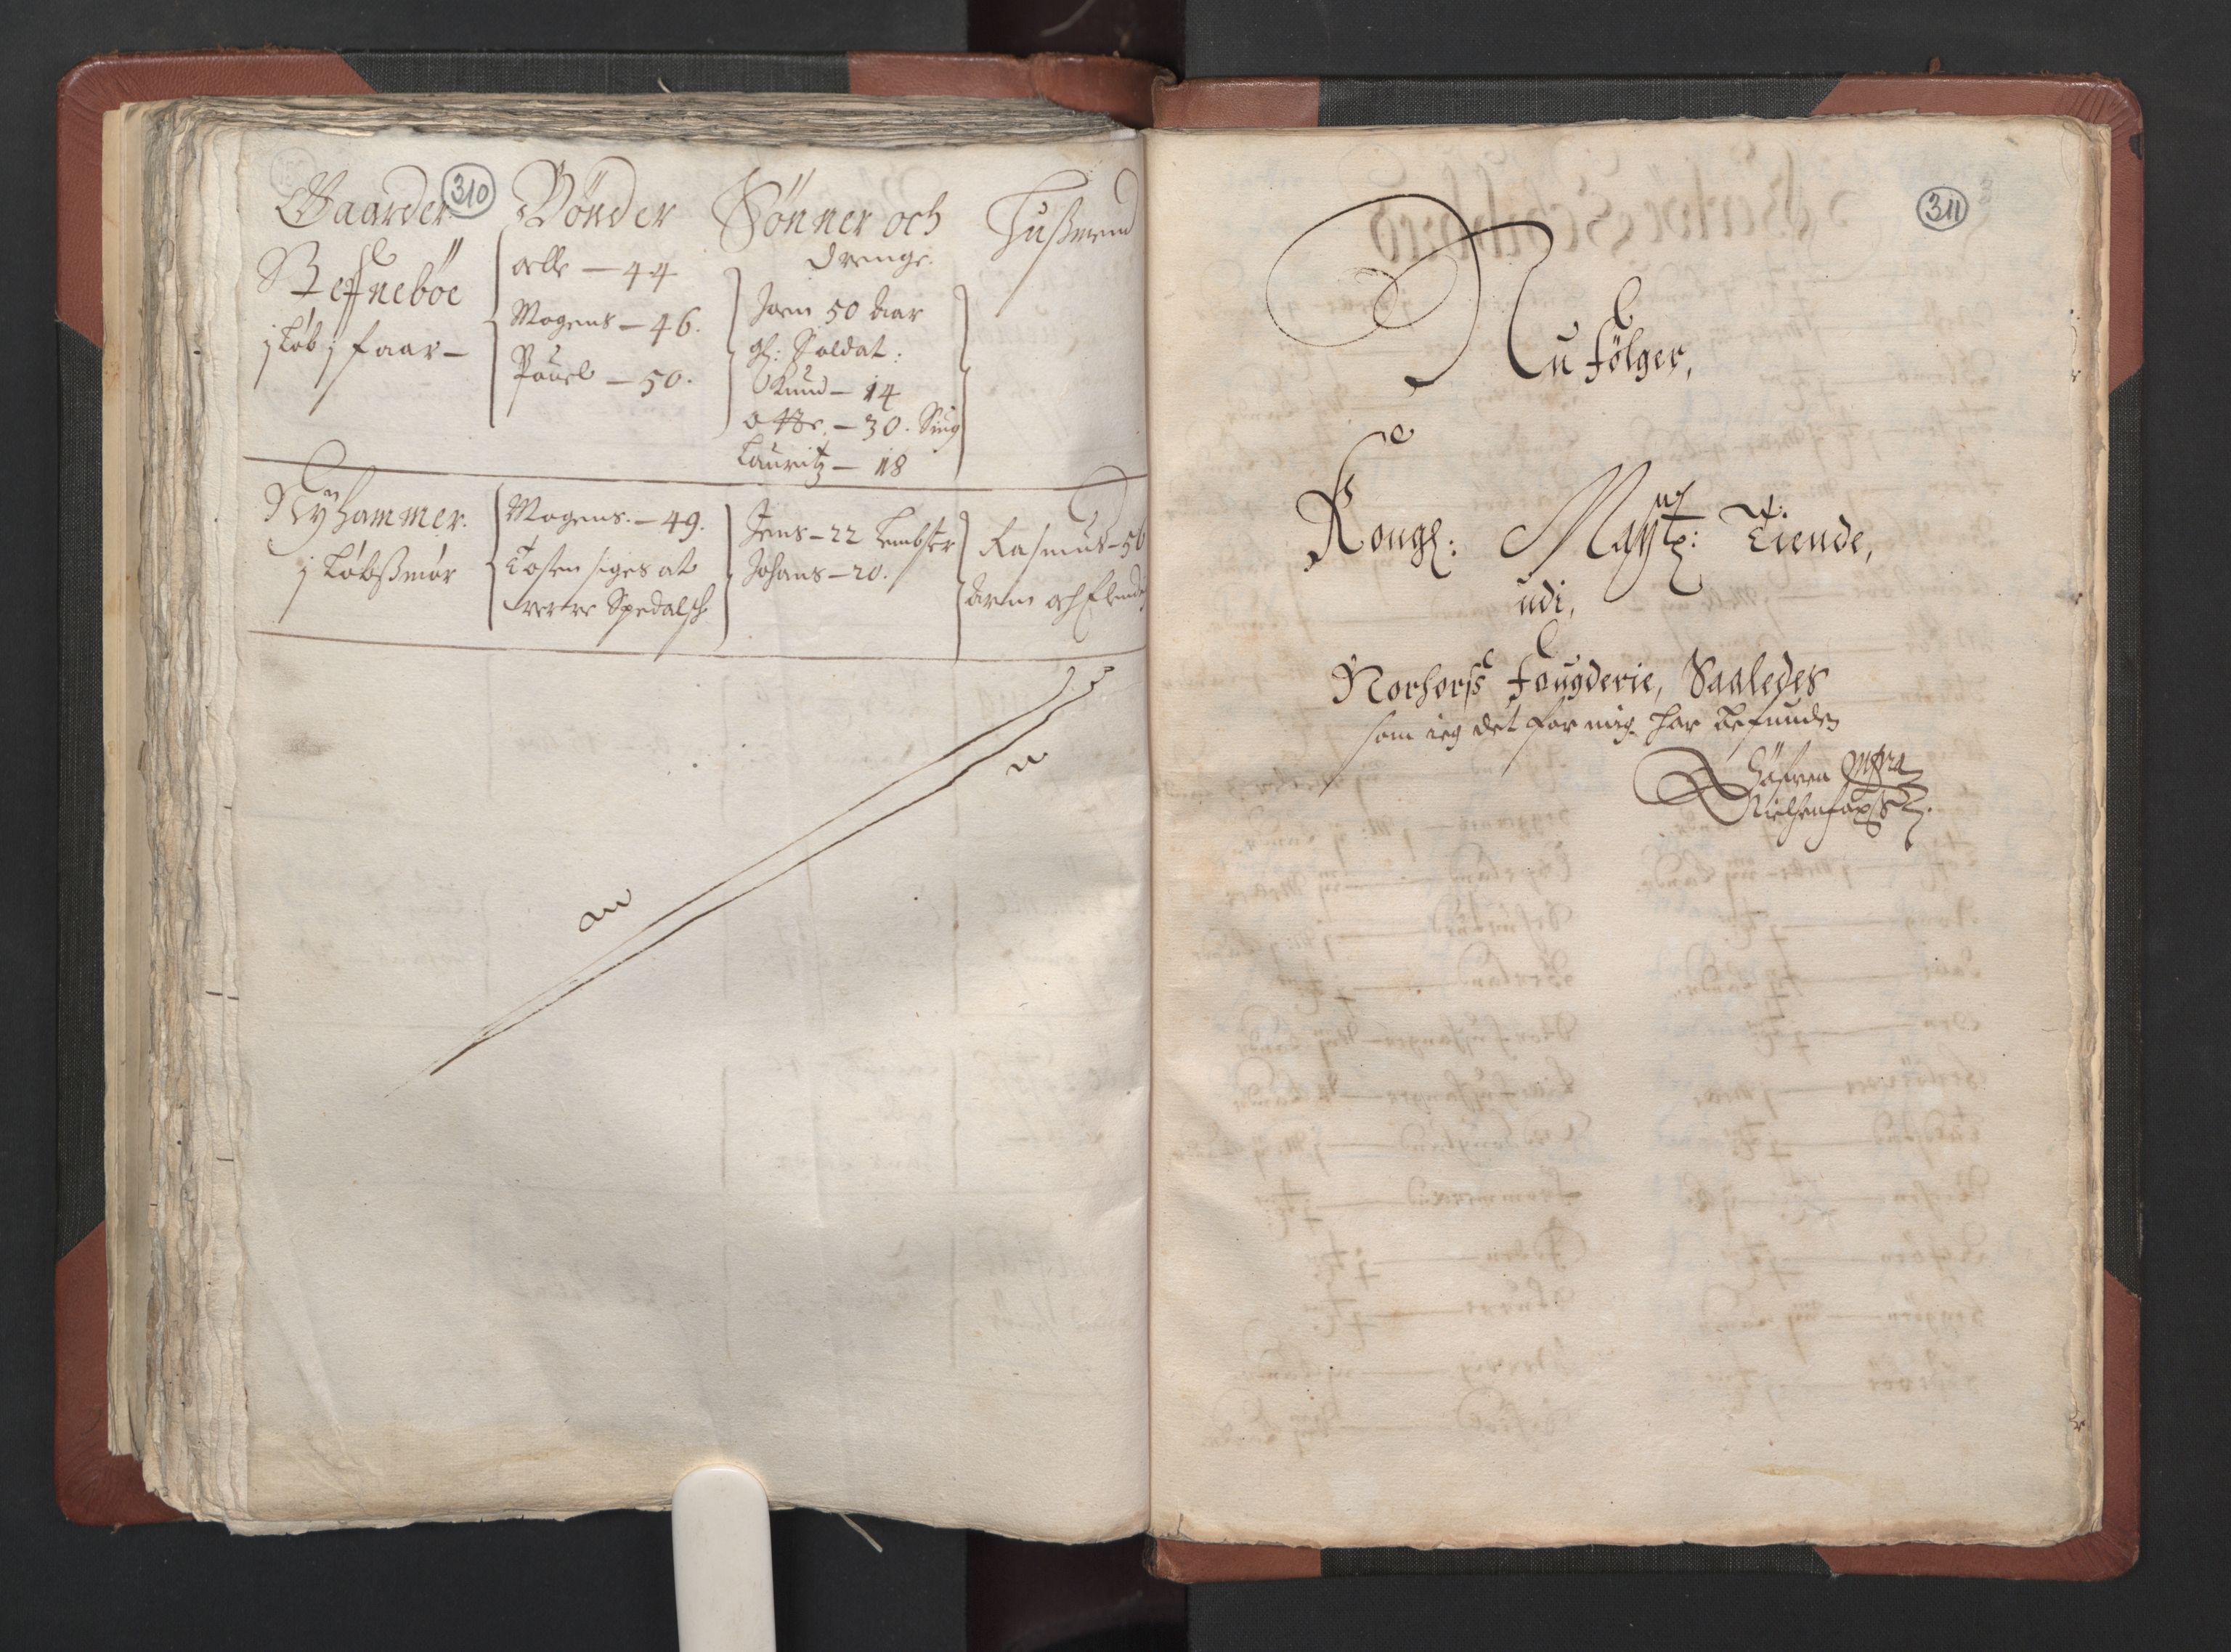 RA, Fogdenes og sorenskrivernes manntall 1664-1666, nr. 13: Nordhordland fogderi og Sunnhordland fogderi, 1665, s. 310-311